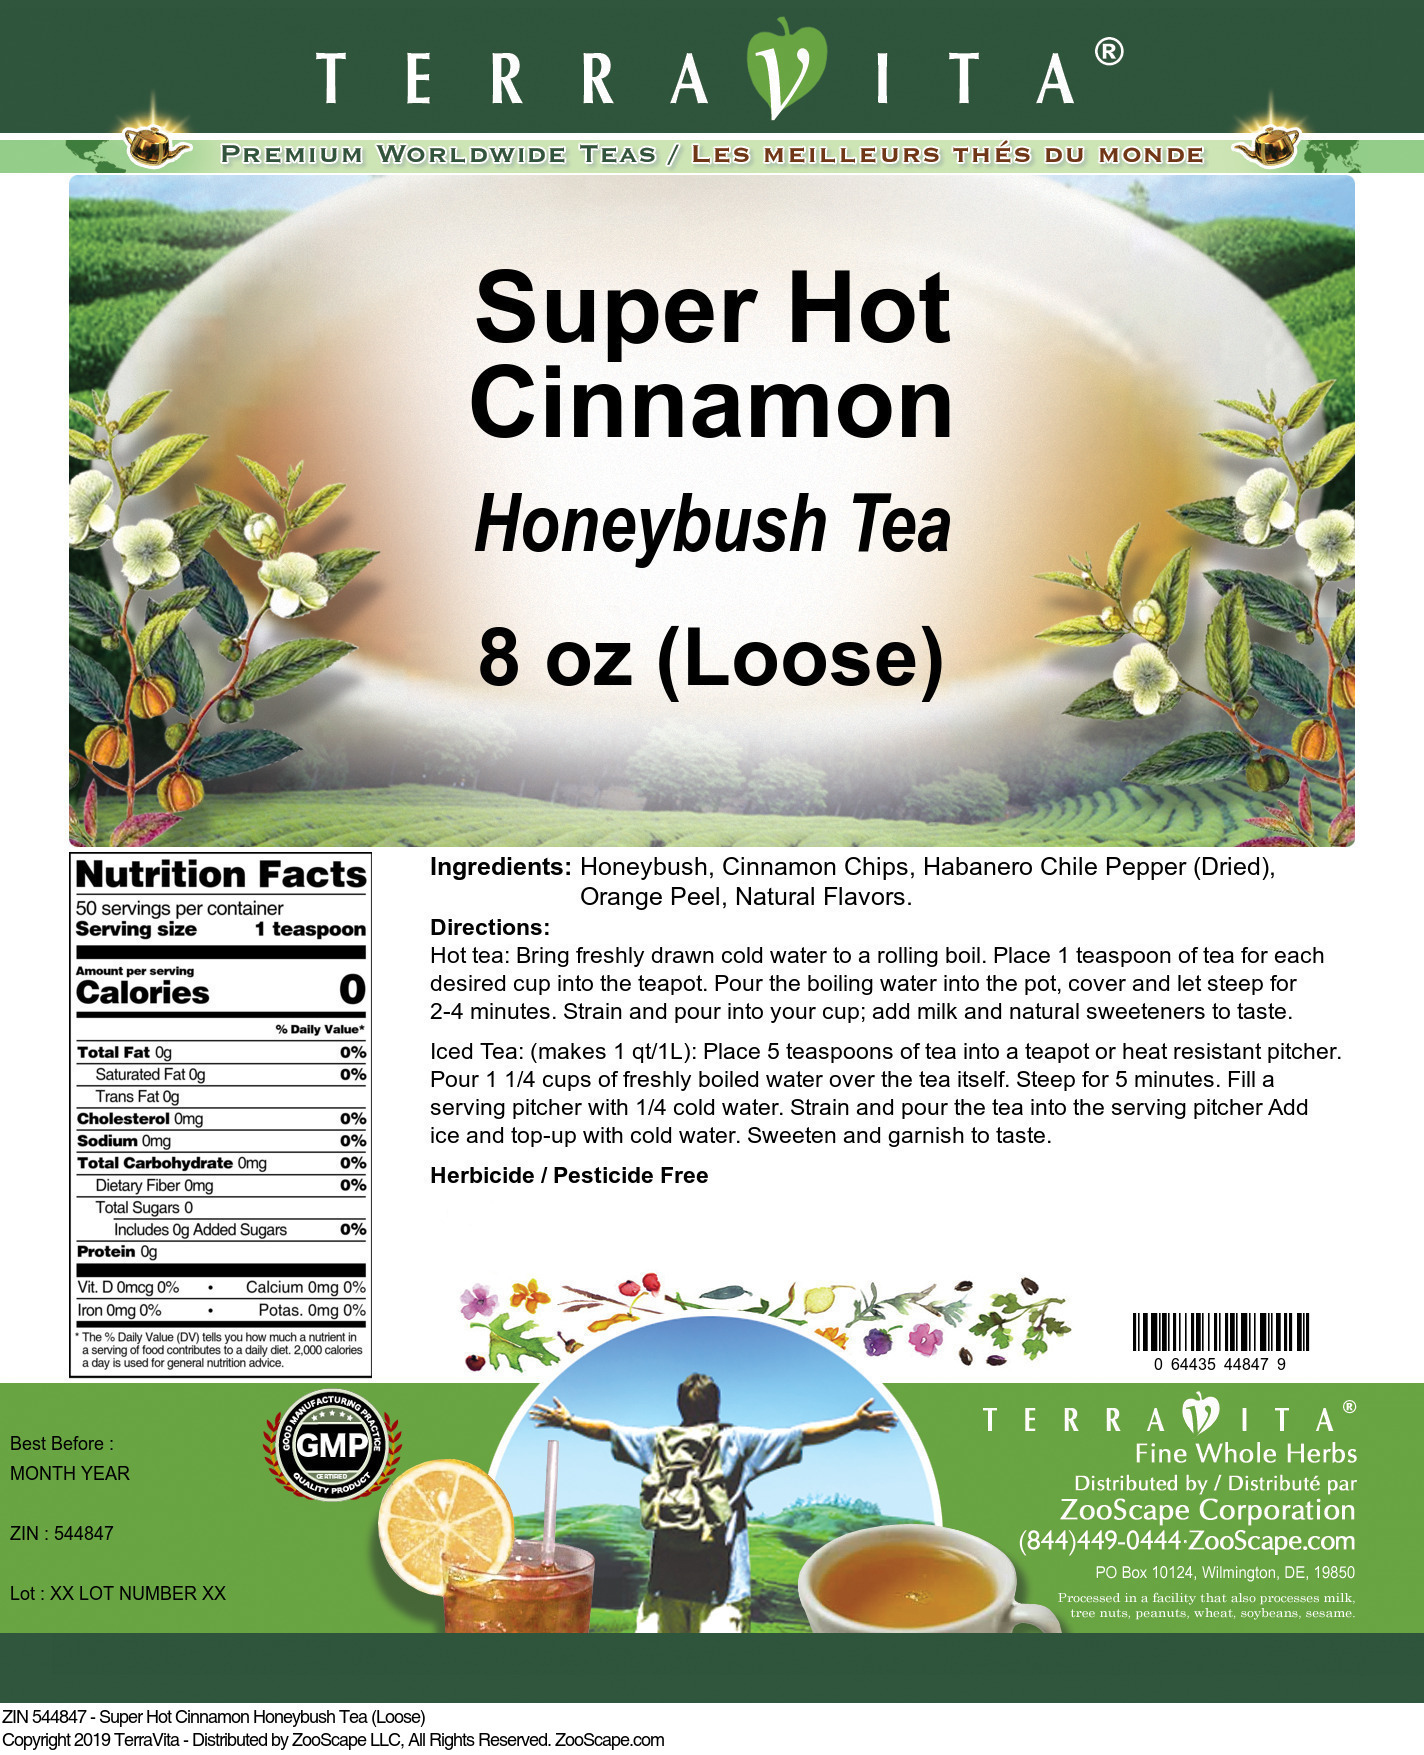 Super Hot Cinnamon Honeybush Tea (Loose)